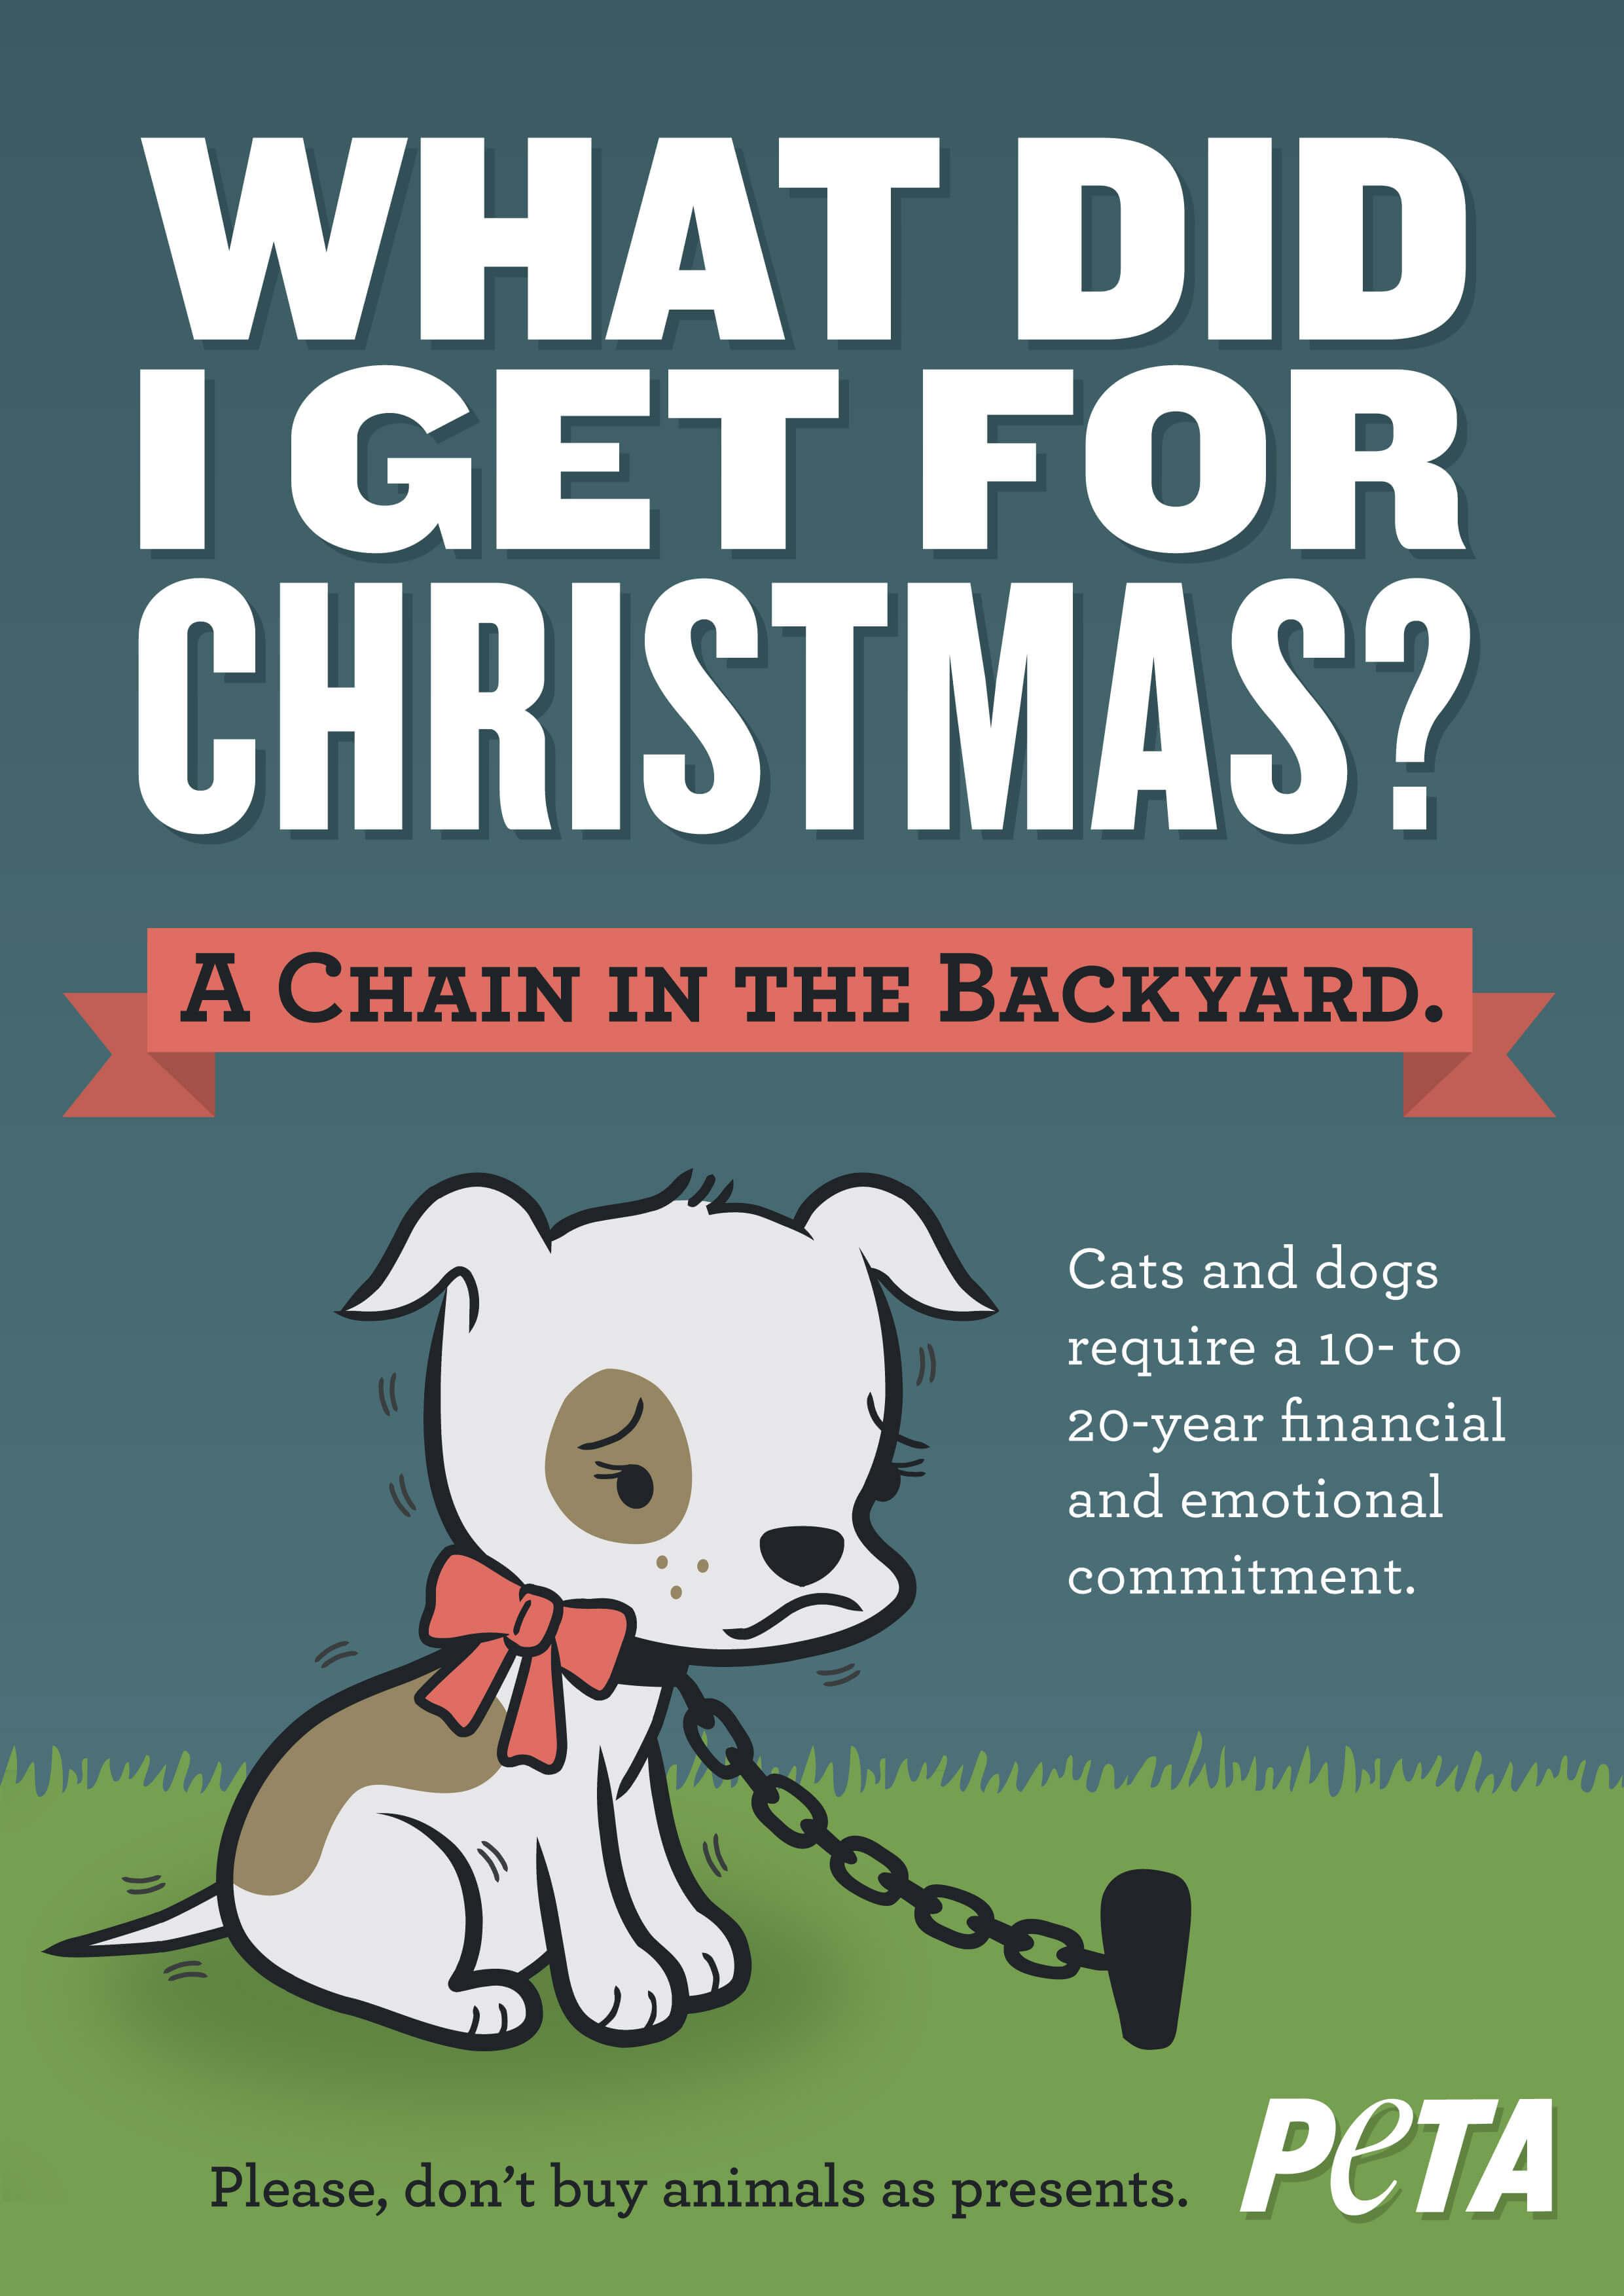 11 Terrible Christmas Ads Lacking Major Holiday Spirit